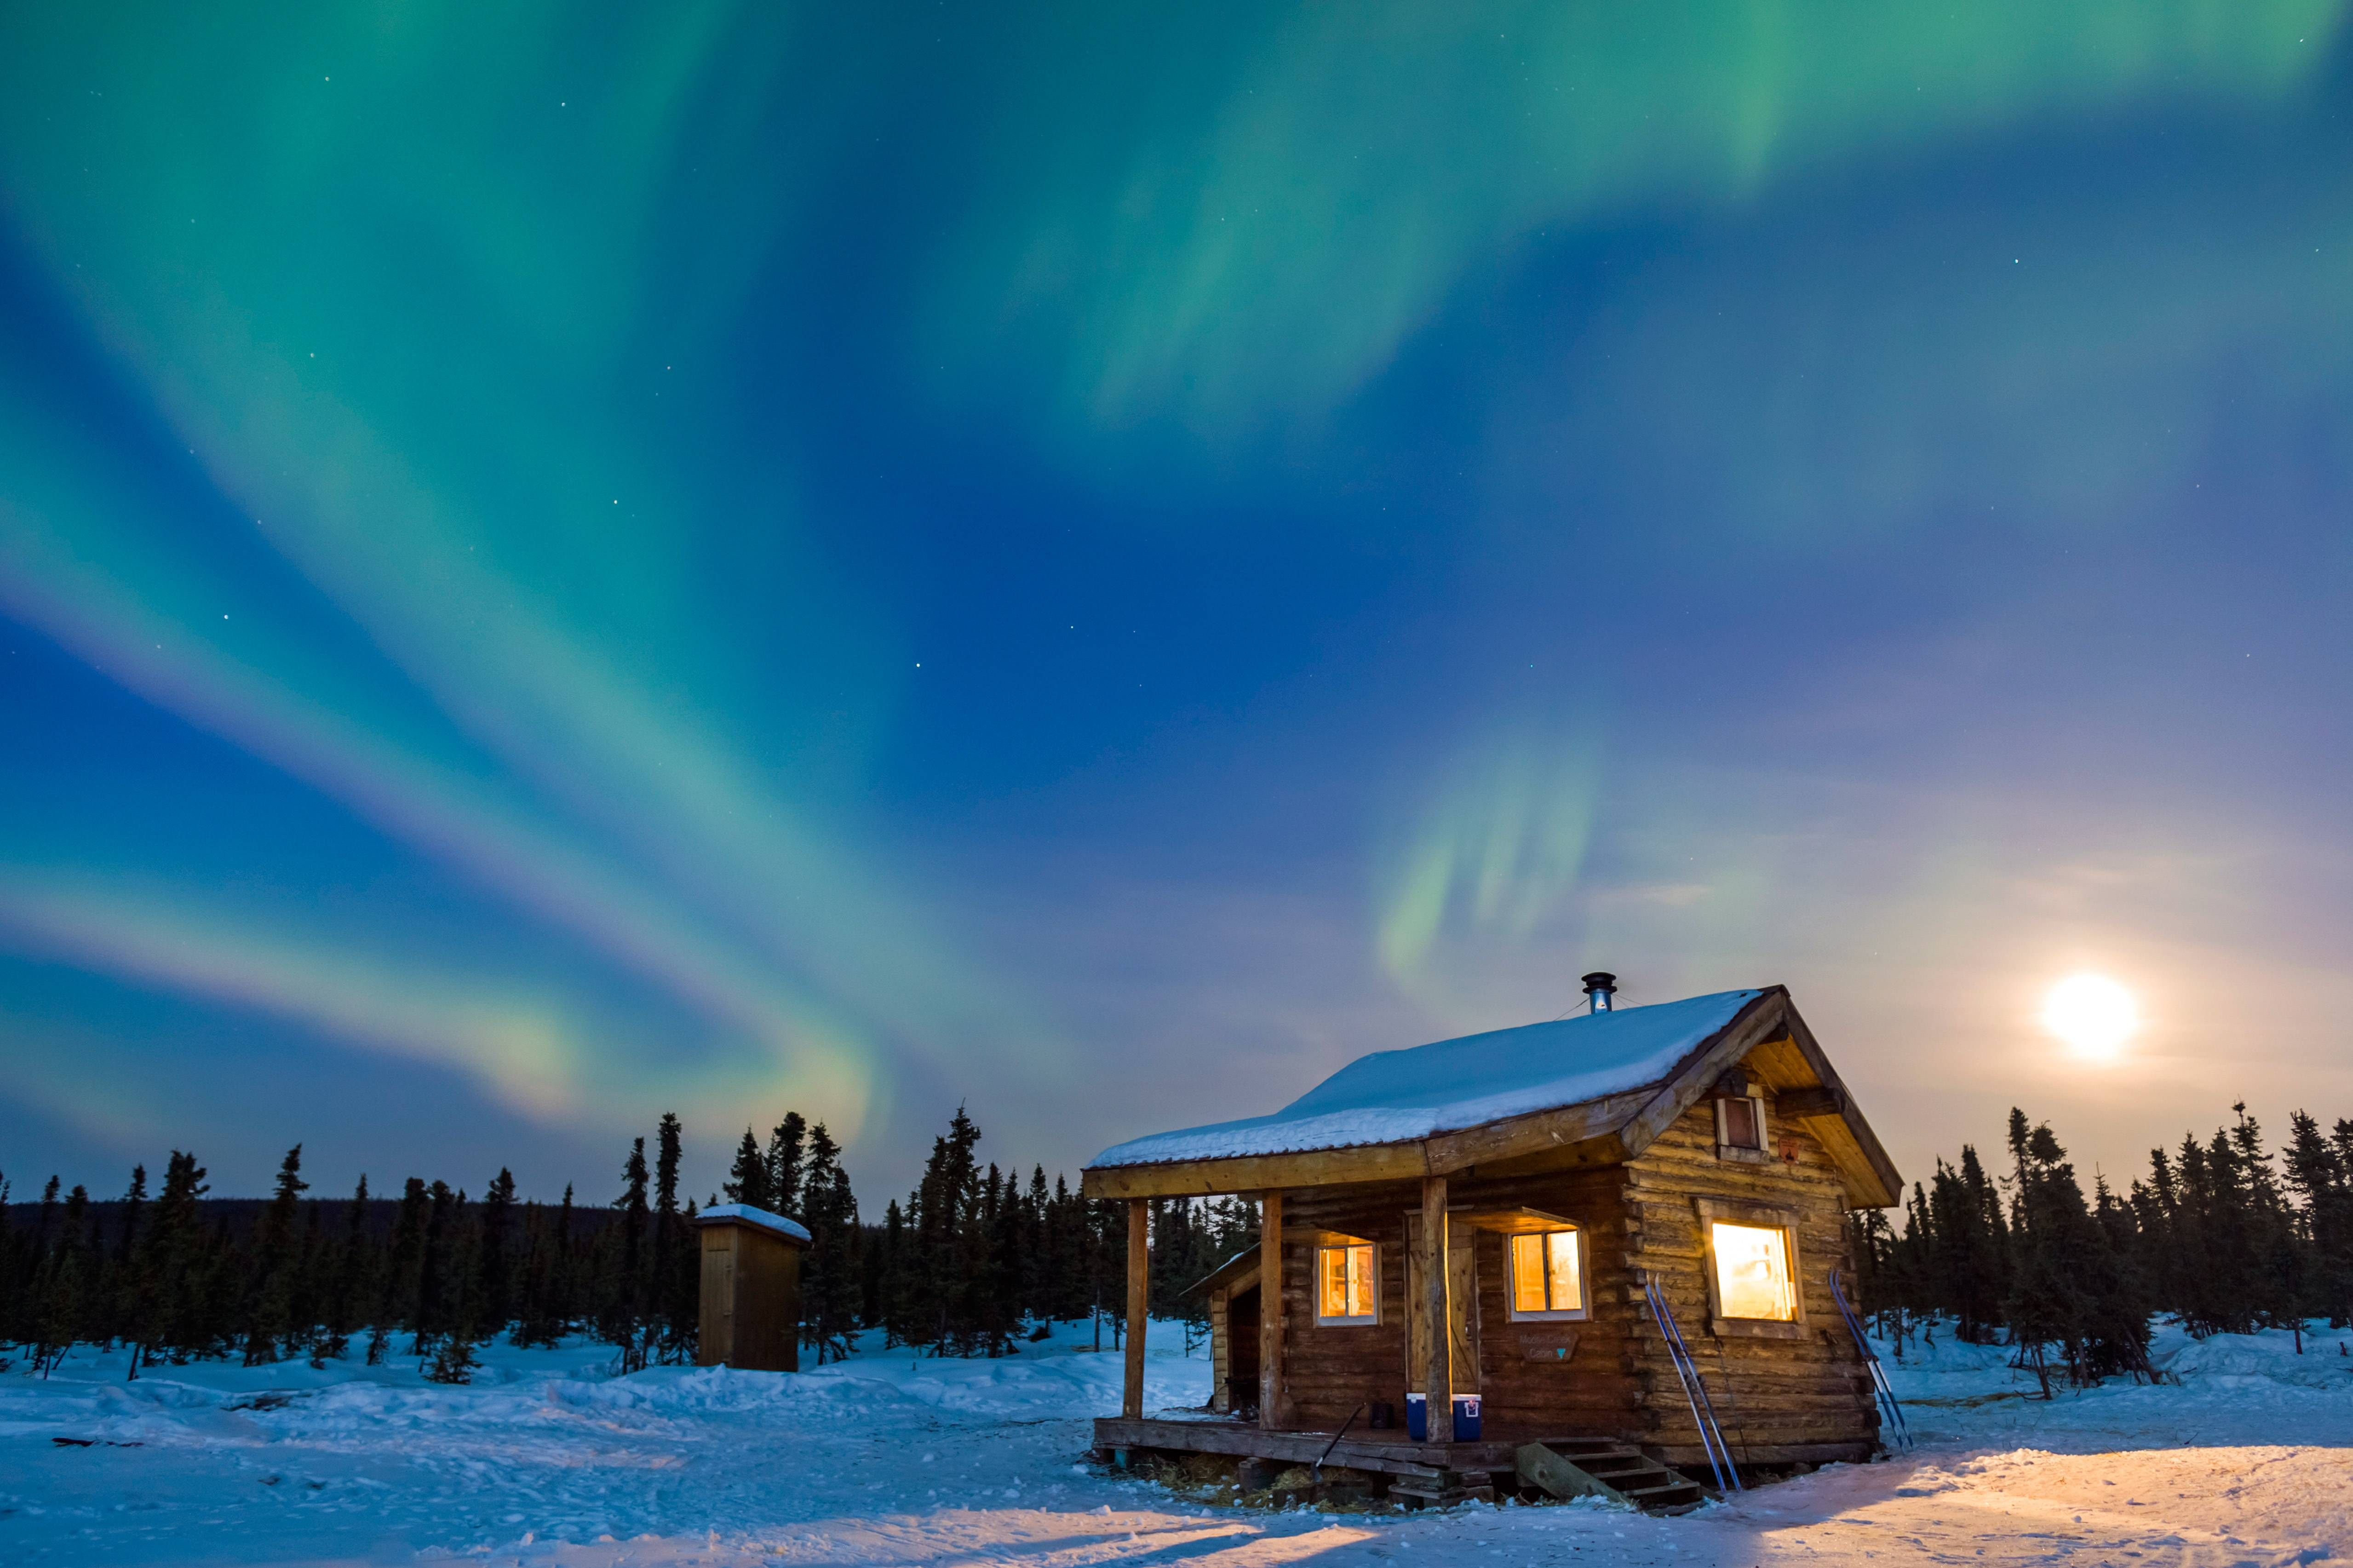 Alaska Cabin Northern Lights 4k Ultra Hd Wallpaper Background Image 5116x3410